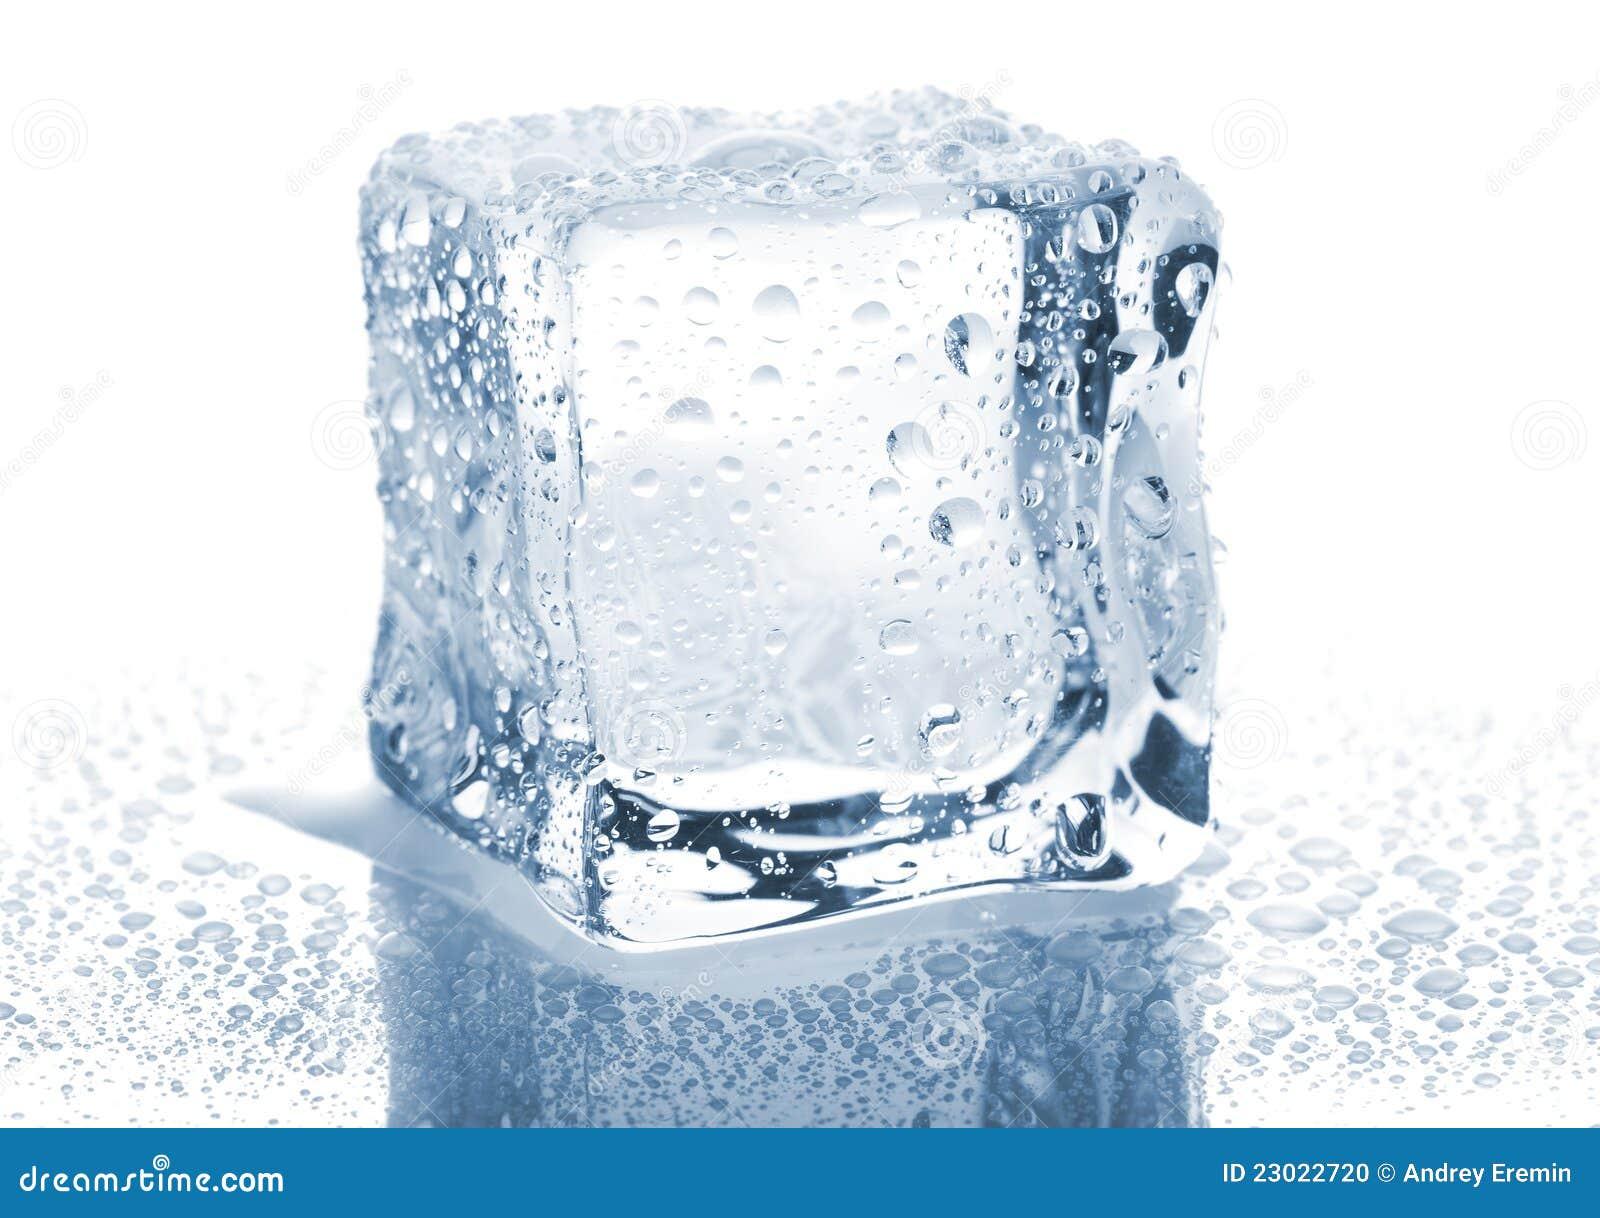 Single ice cube